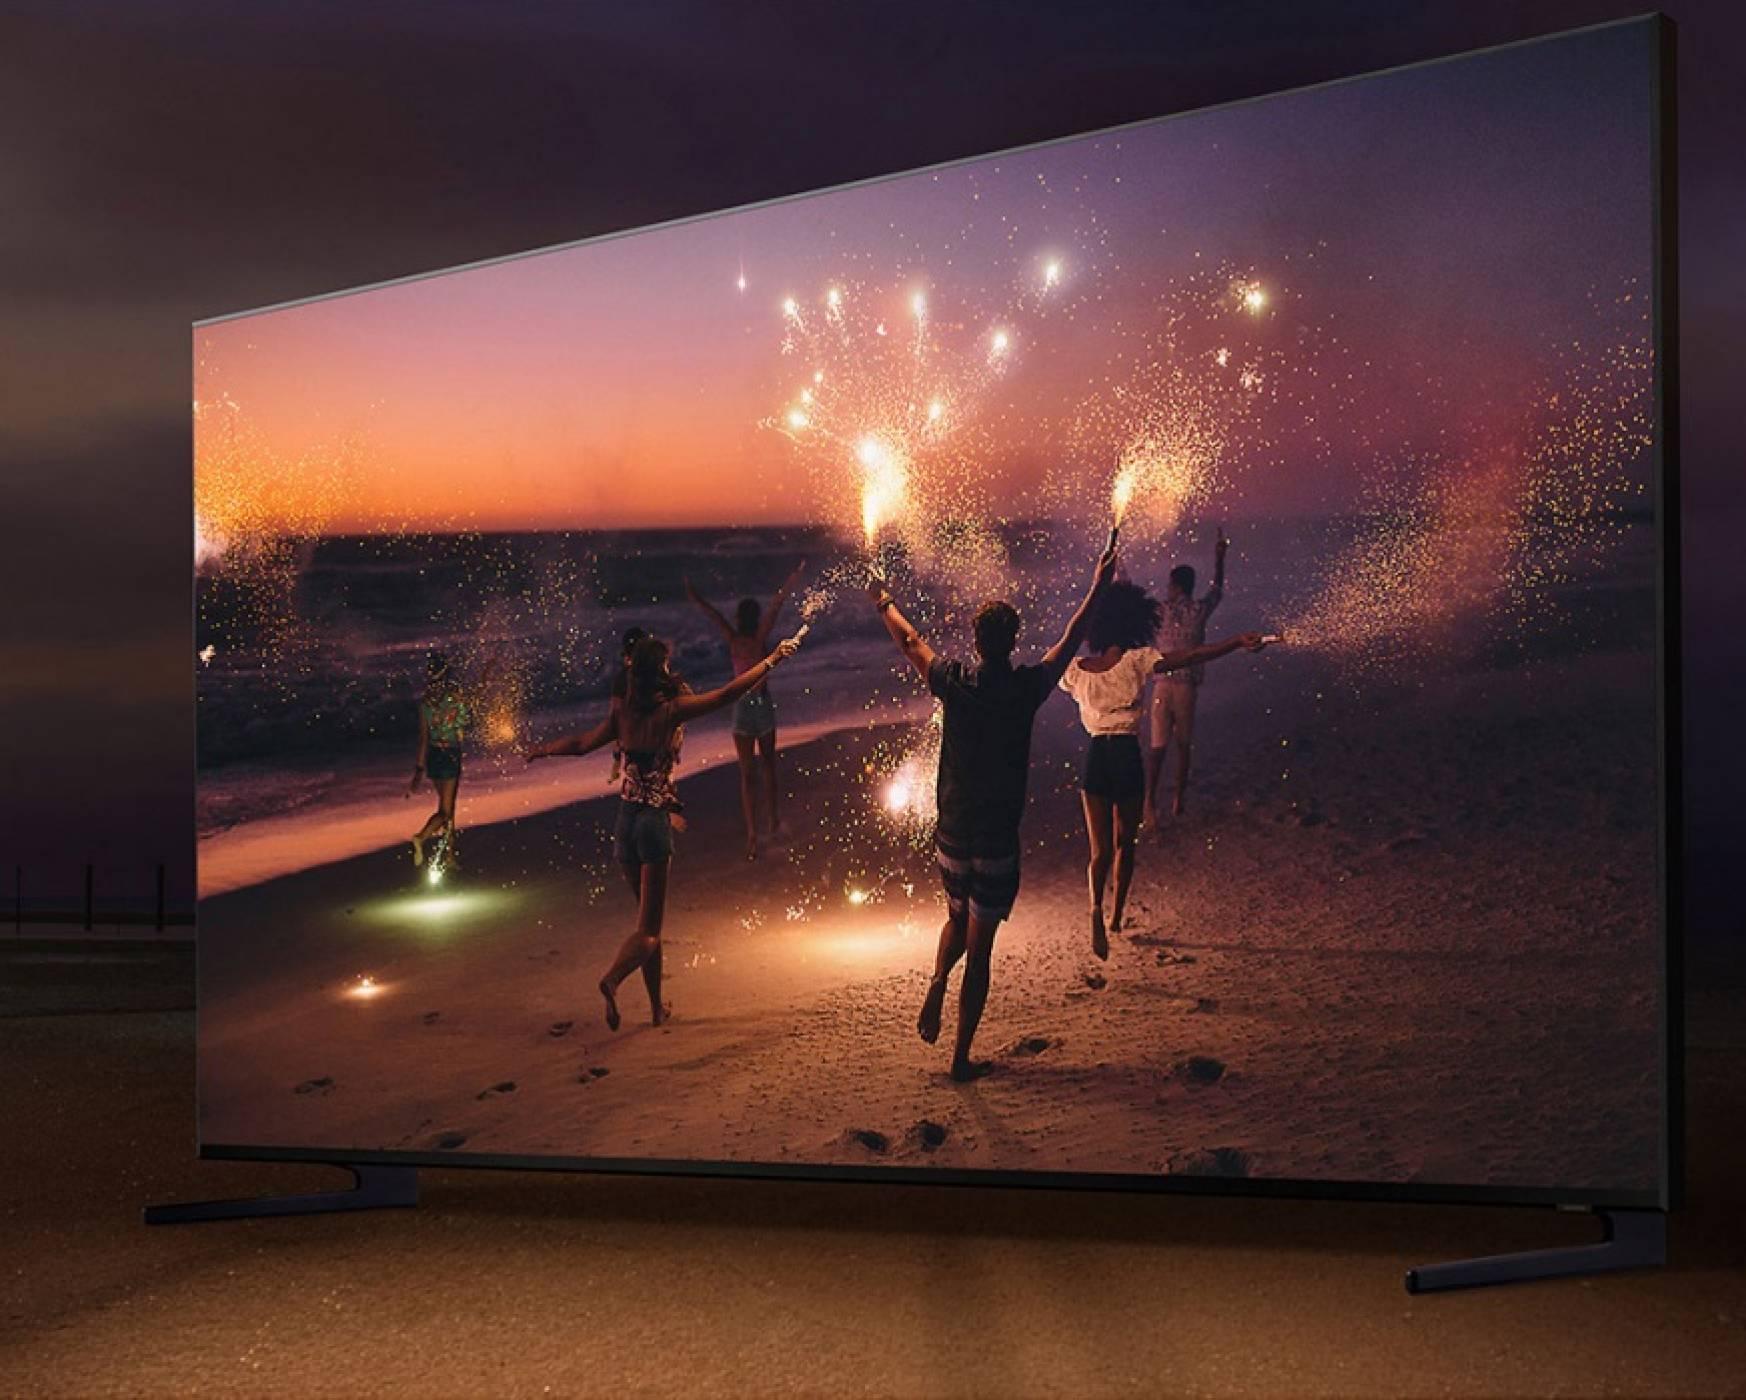 Samsung QE85Q900R  - 8К ТВ рез(в)олюция (РЕВЮ)